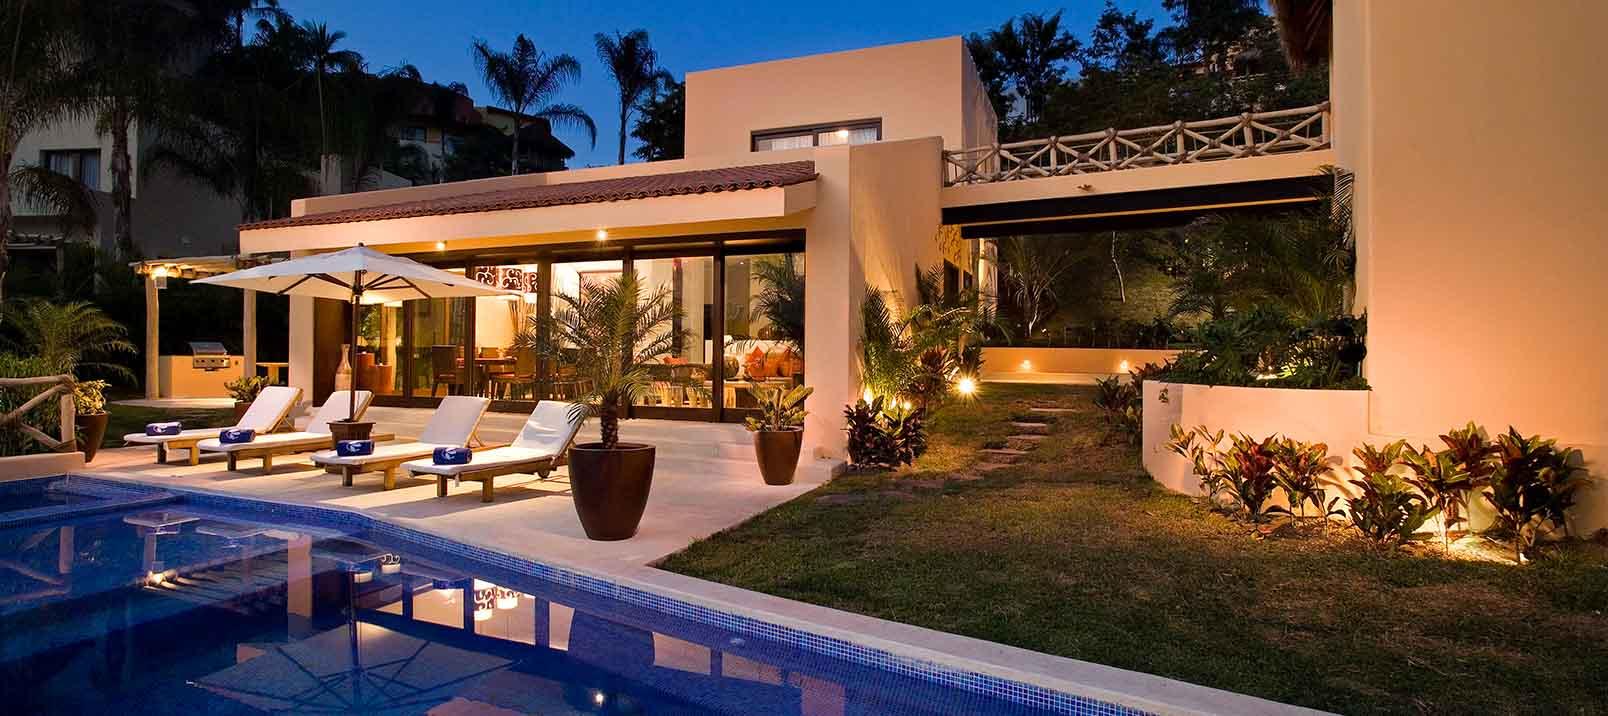 er-residence-header-disp-residence-real-del-mar-casa-del-puente-1.jpg